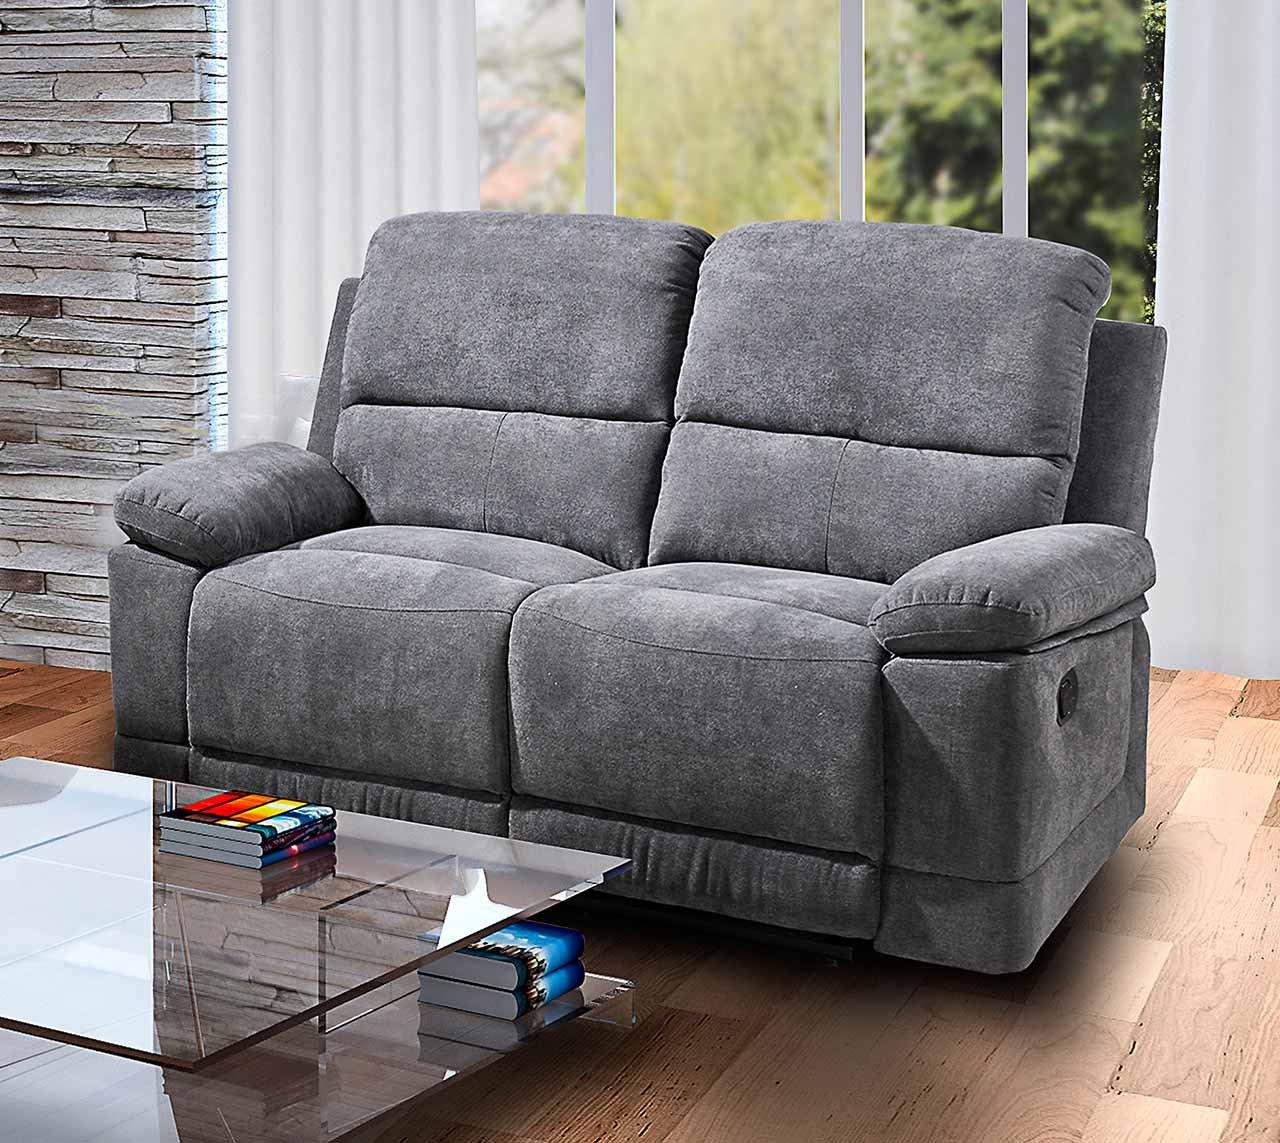 Full Size of Lifestyle4living 2 Sitzer Sofa In Grauer Microfaser Mit 2er Grau Wohnzimmer Kinosessel 2er Microfaser